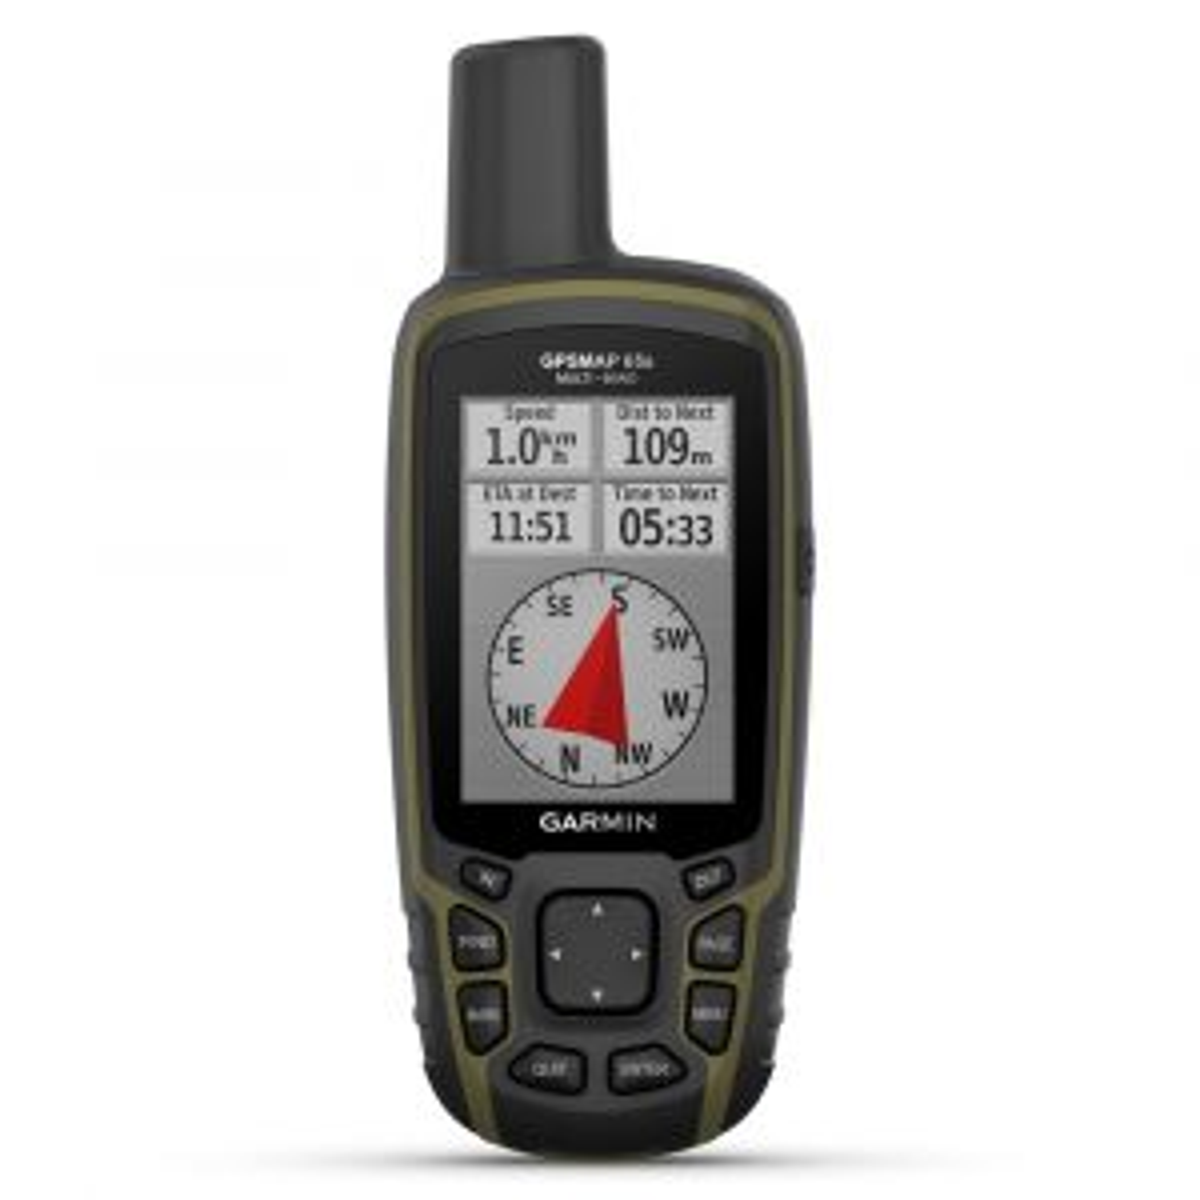 GPSMAP 65s GPS-Handgerät Outdoornavigationsgerät mit Höhenmesser und Kompass